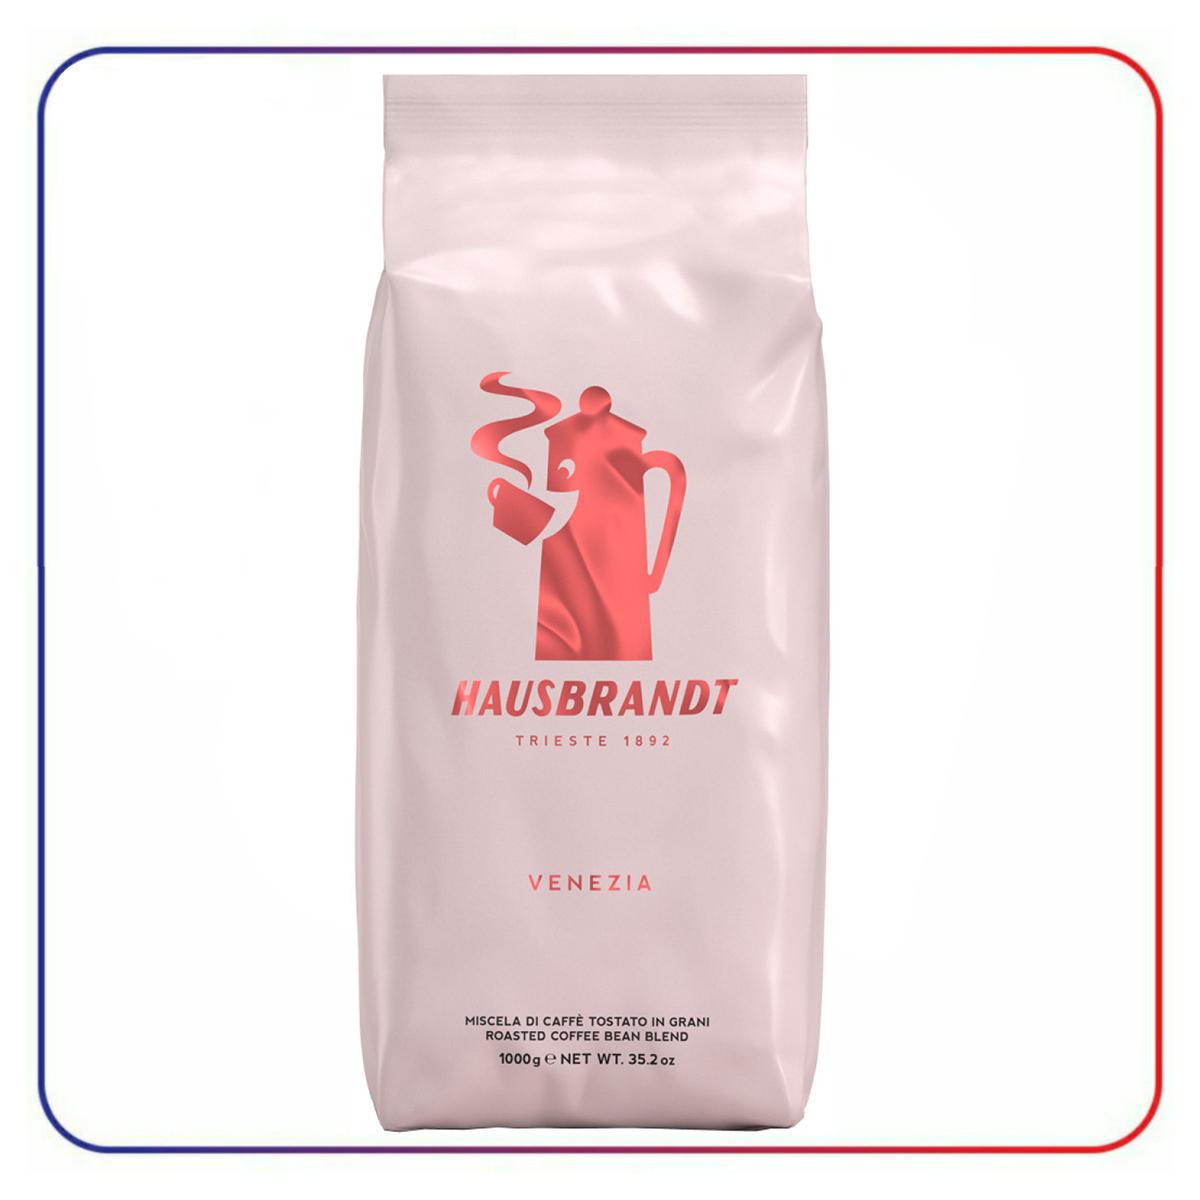 دانه قهوه هاوس برنت ونیزیا HAUSBRANDT VENEZIA